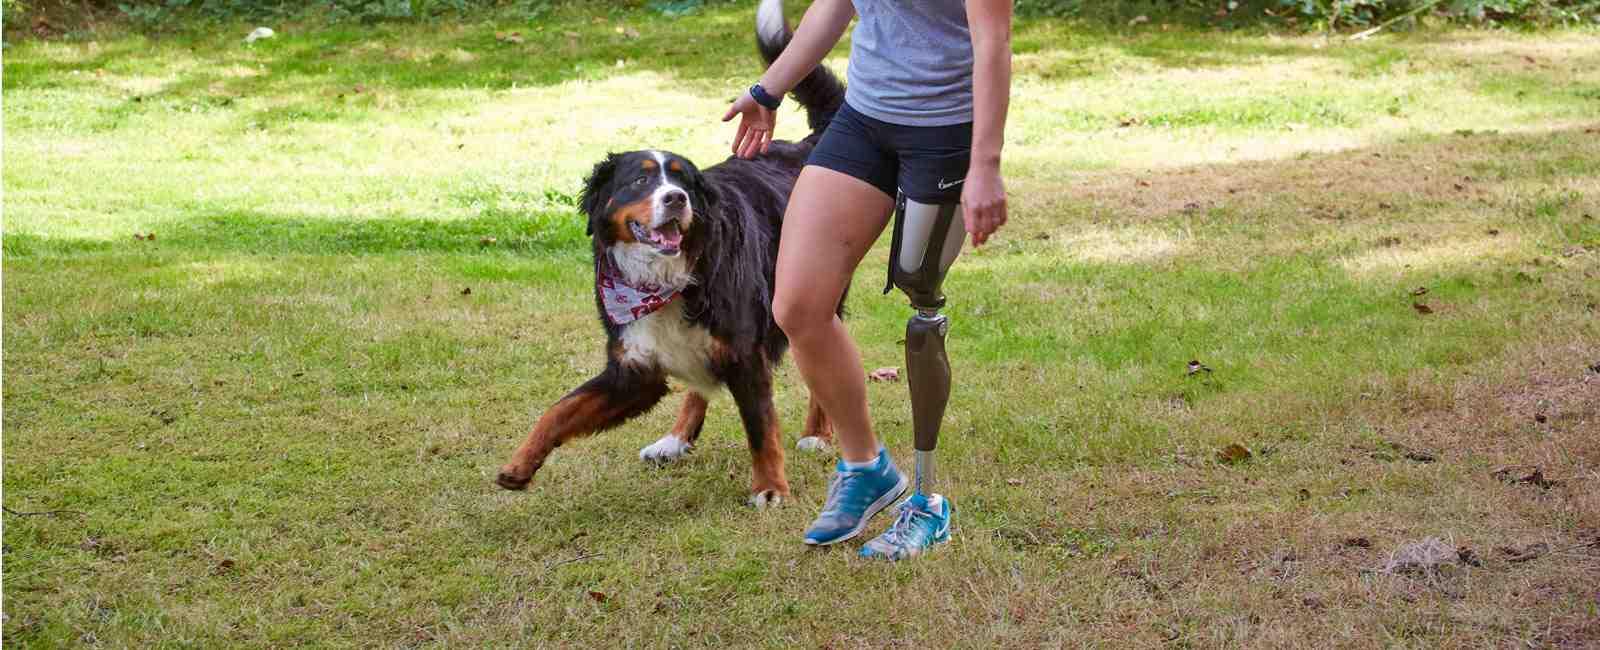 Enjoy a jog with your favorite dog.